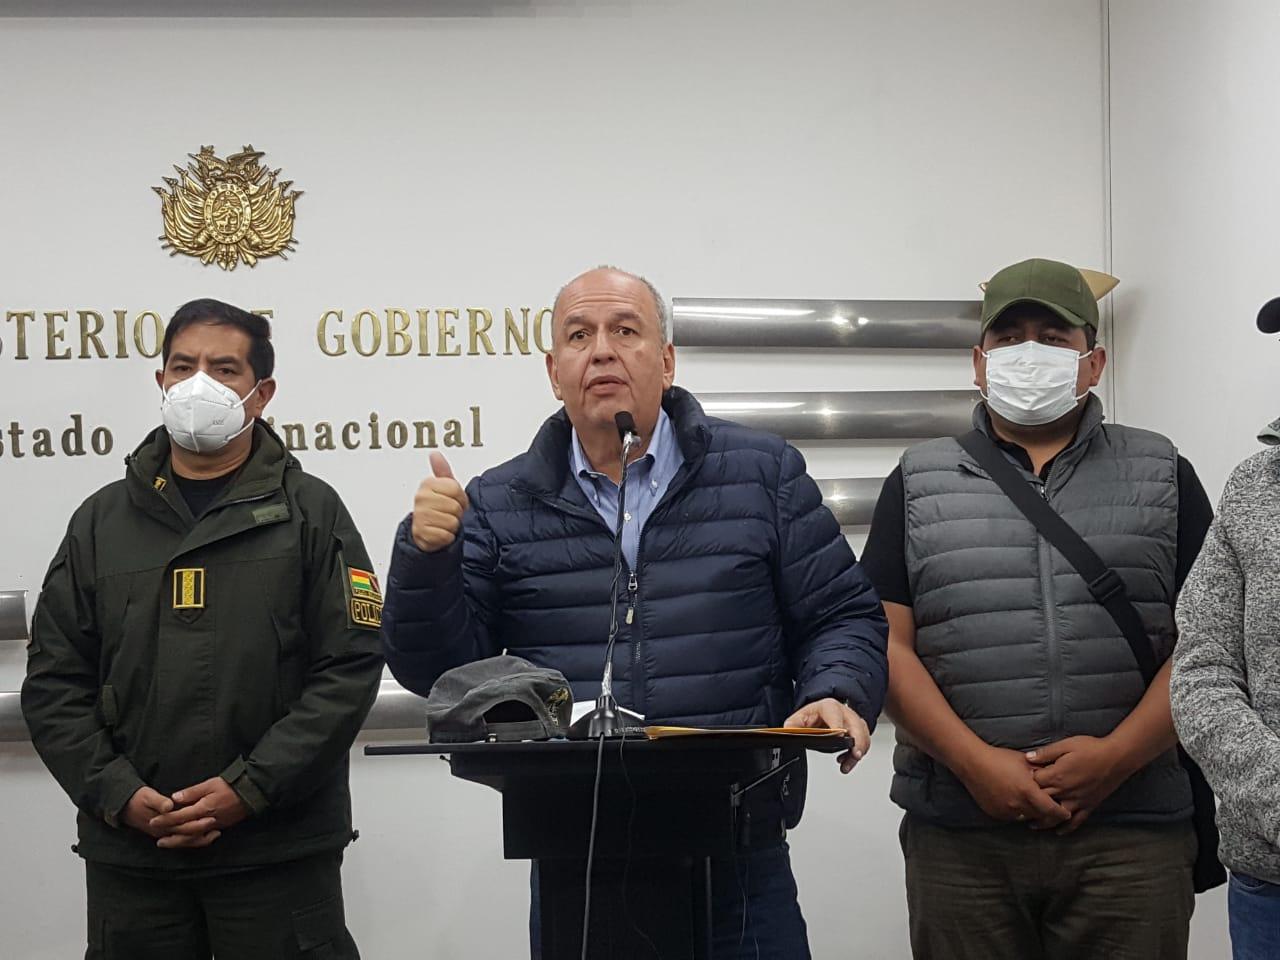 Bolivia: piden extradición del exministro de facto Murillo